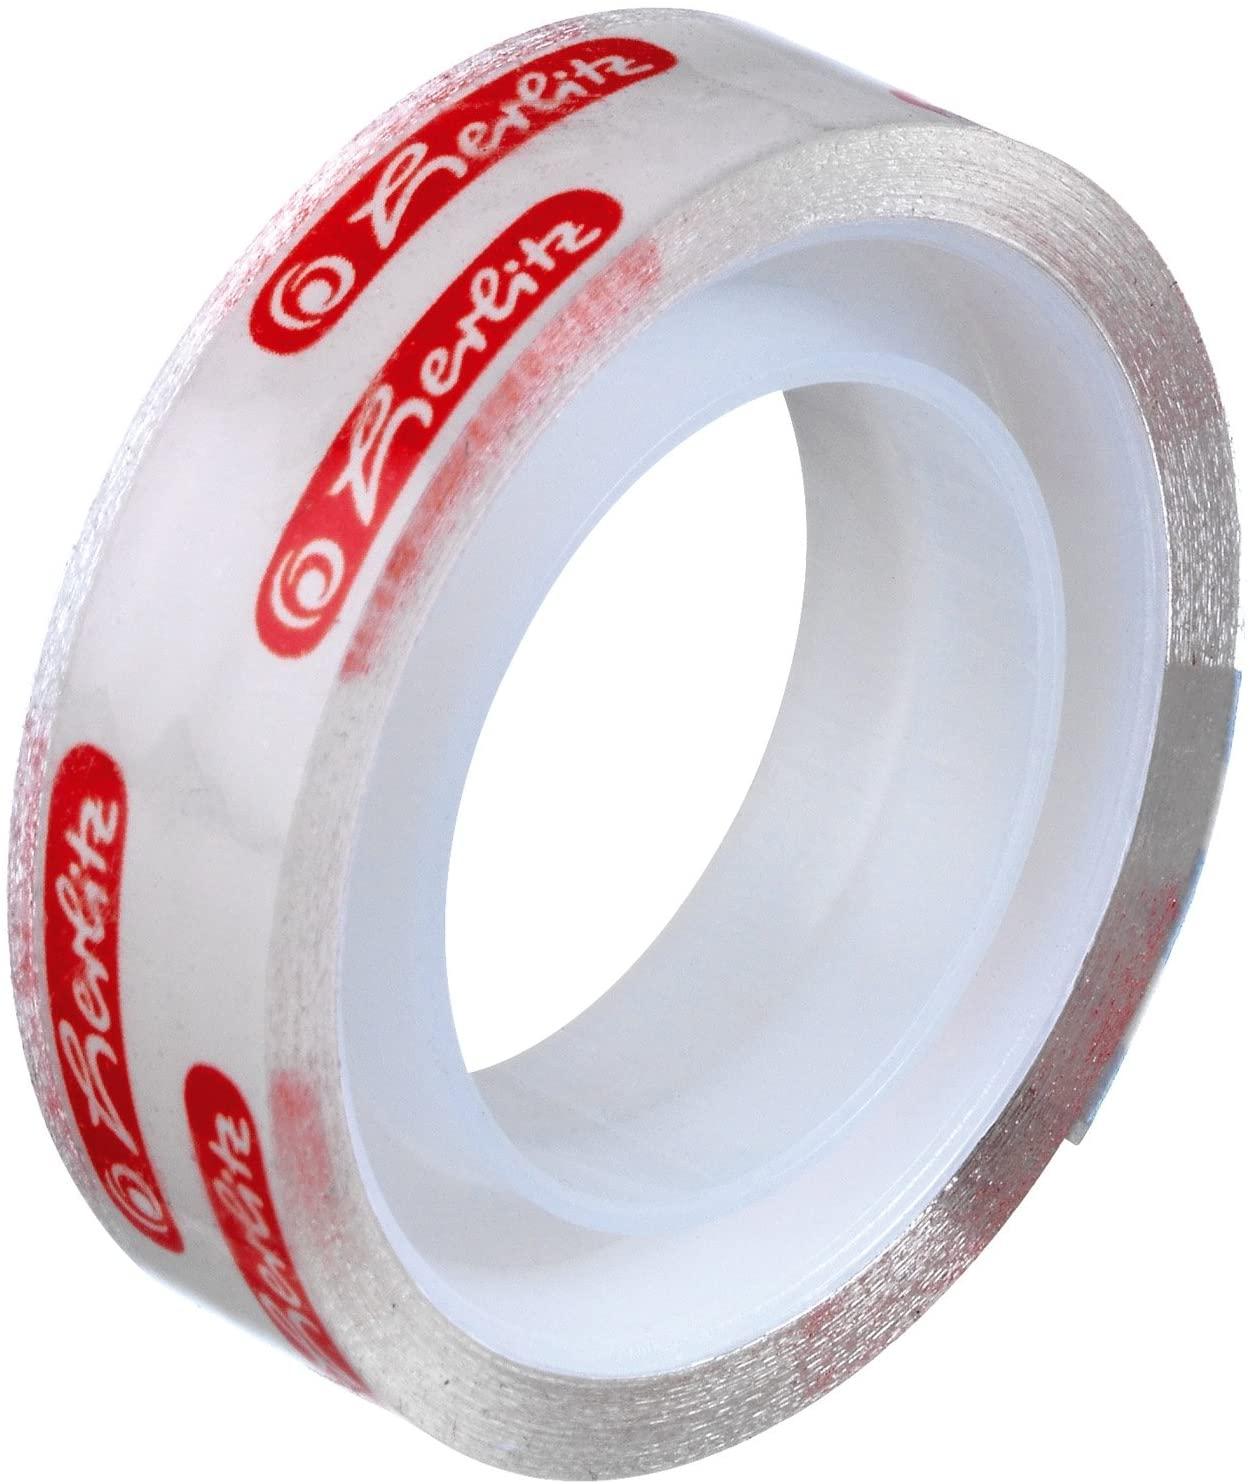 Herlitz Adhesive Film / Tape 10 m x 12 mm Transparent 43p (+£4.49 non prime) (UK Mainland) Sold by Amazon EU @ Amazon